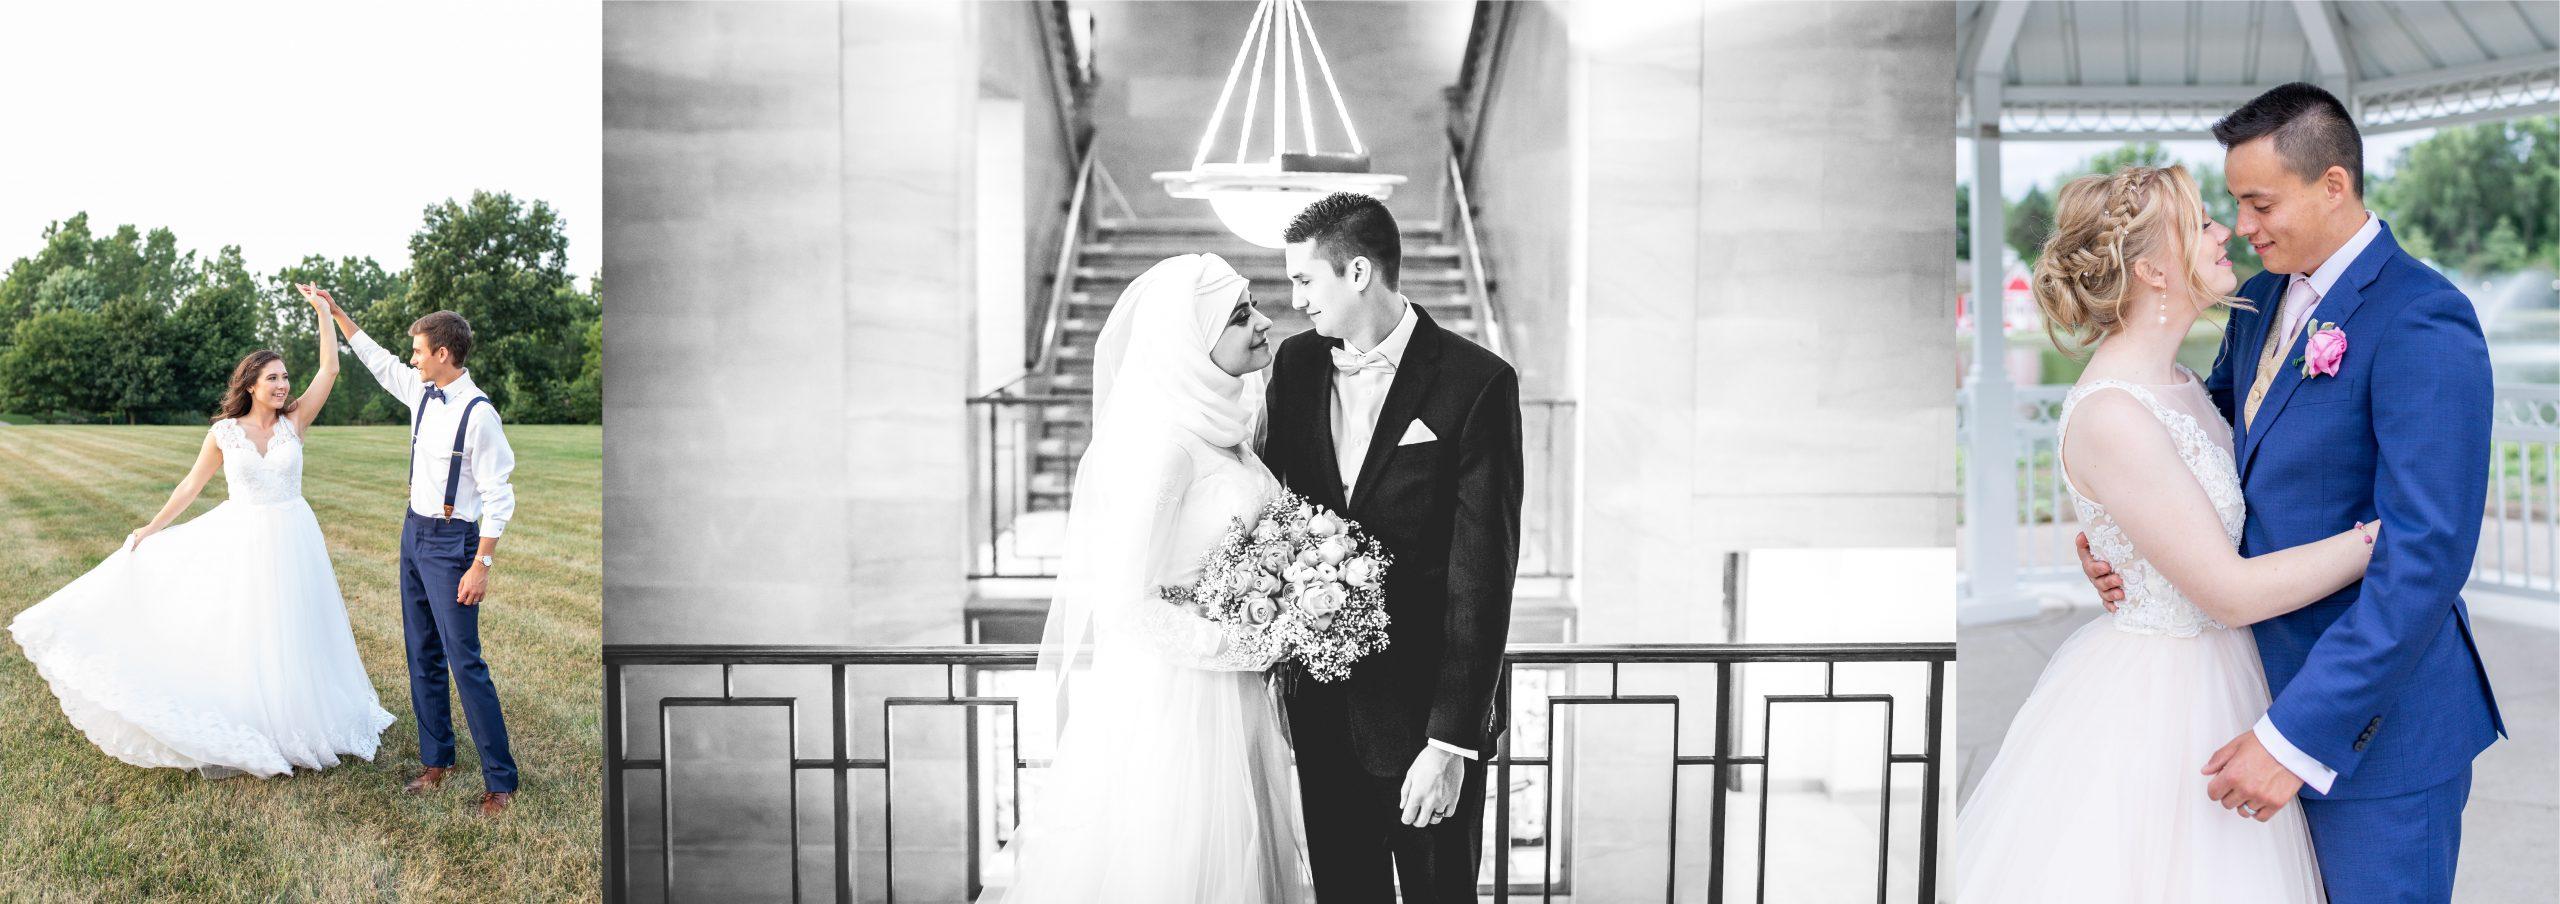 kandra-lynn-photography-michigan-wedding-photographer-20